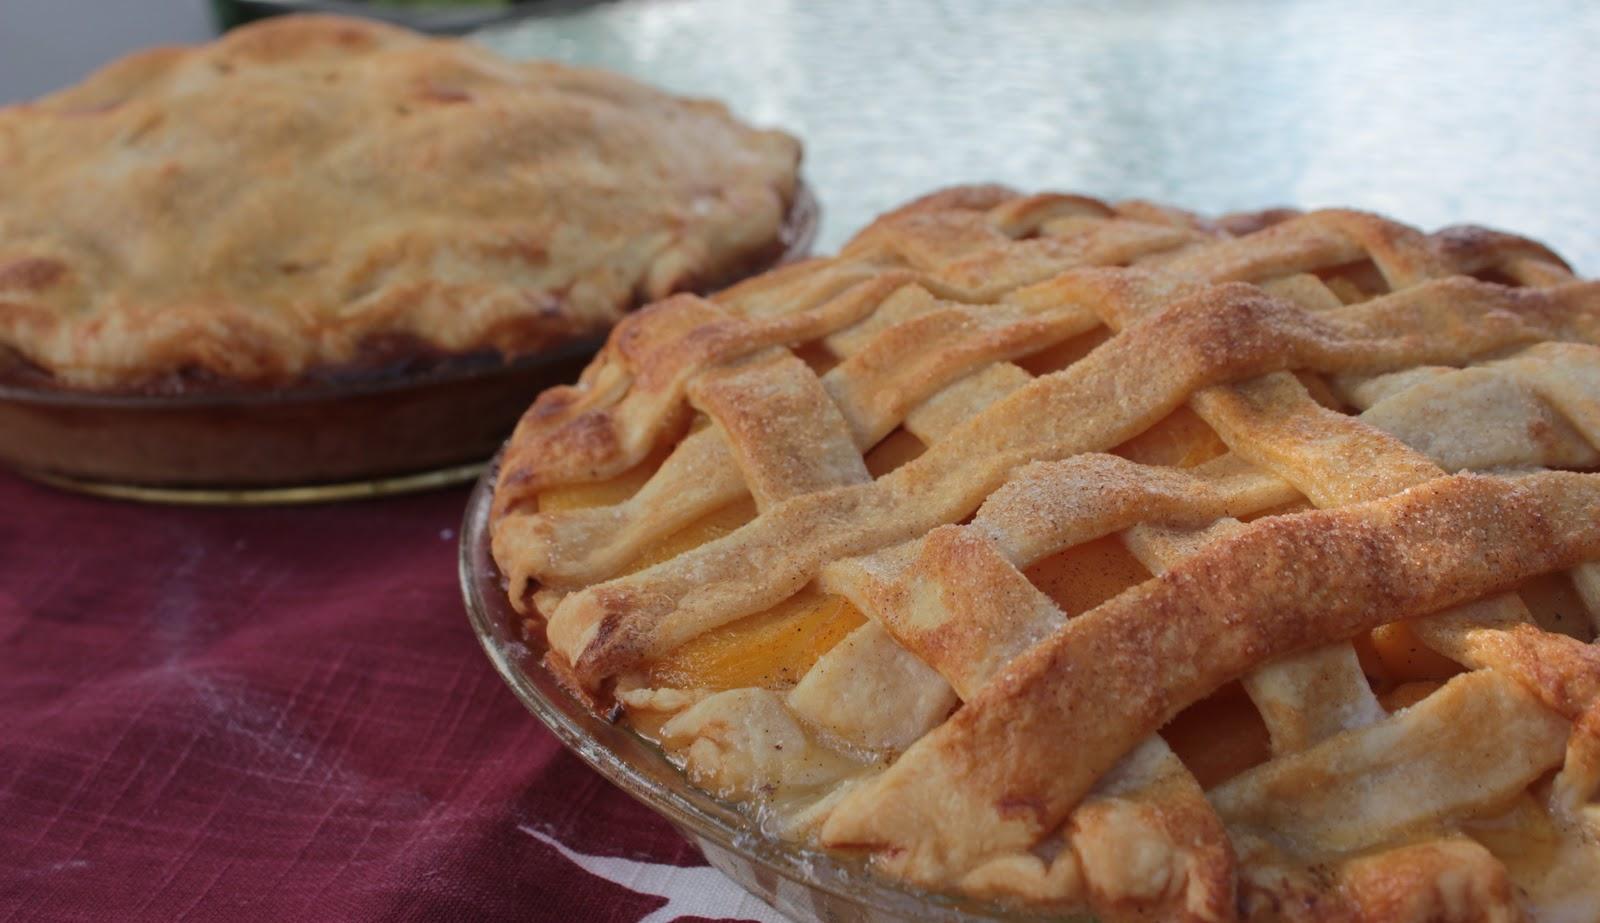 Vanilla and Cardamom Peach Pie